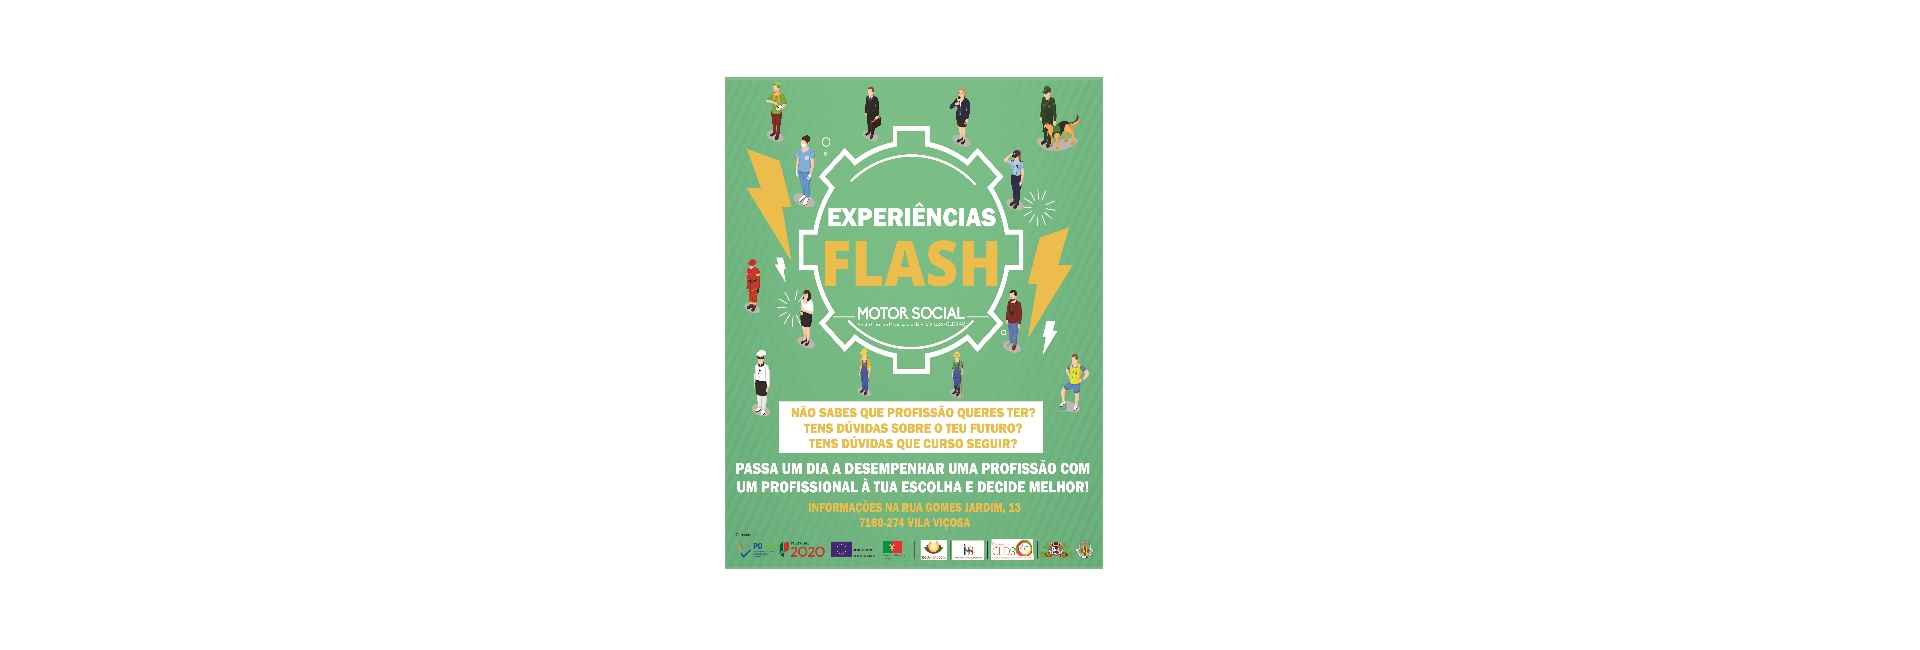 Experiências Flash – Motor Social